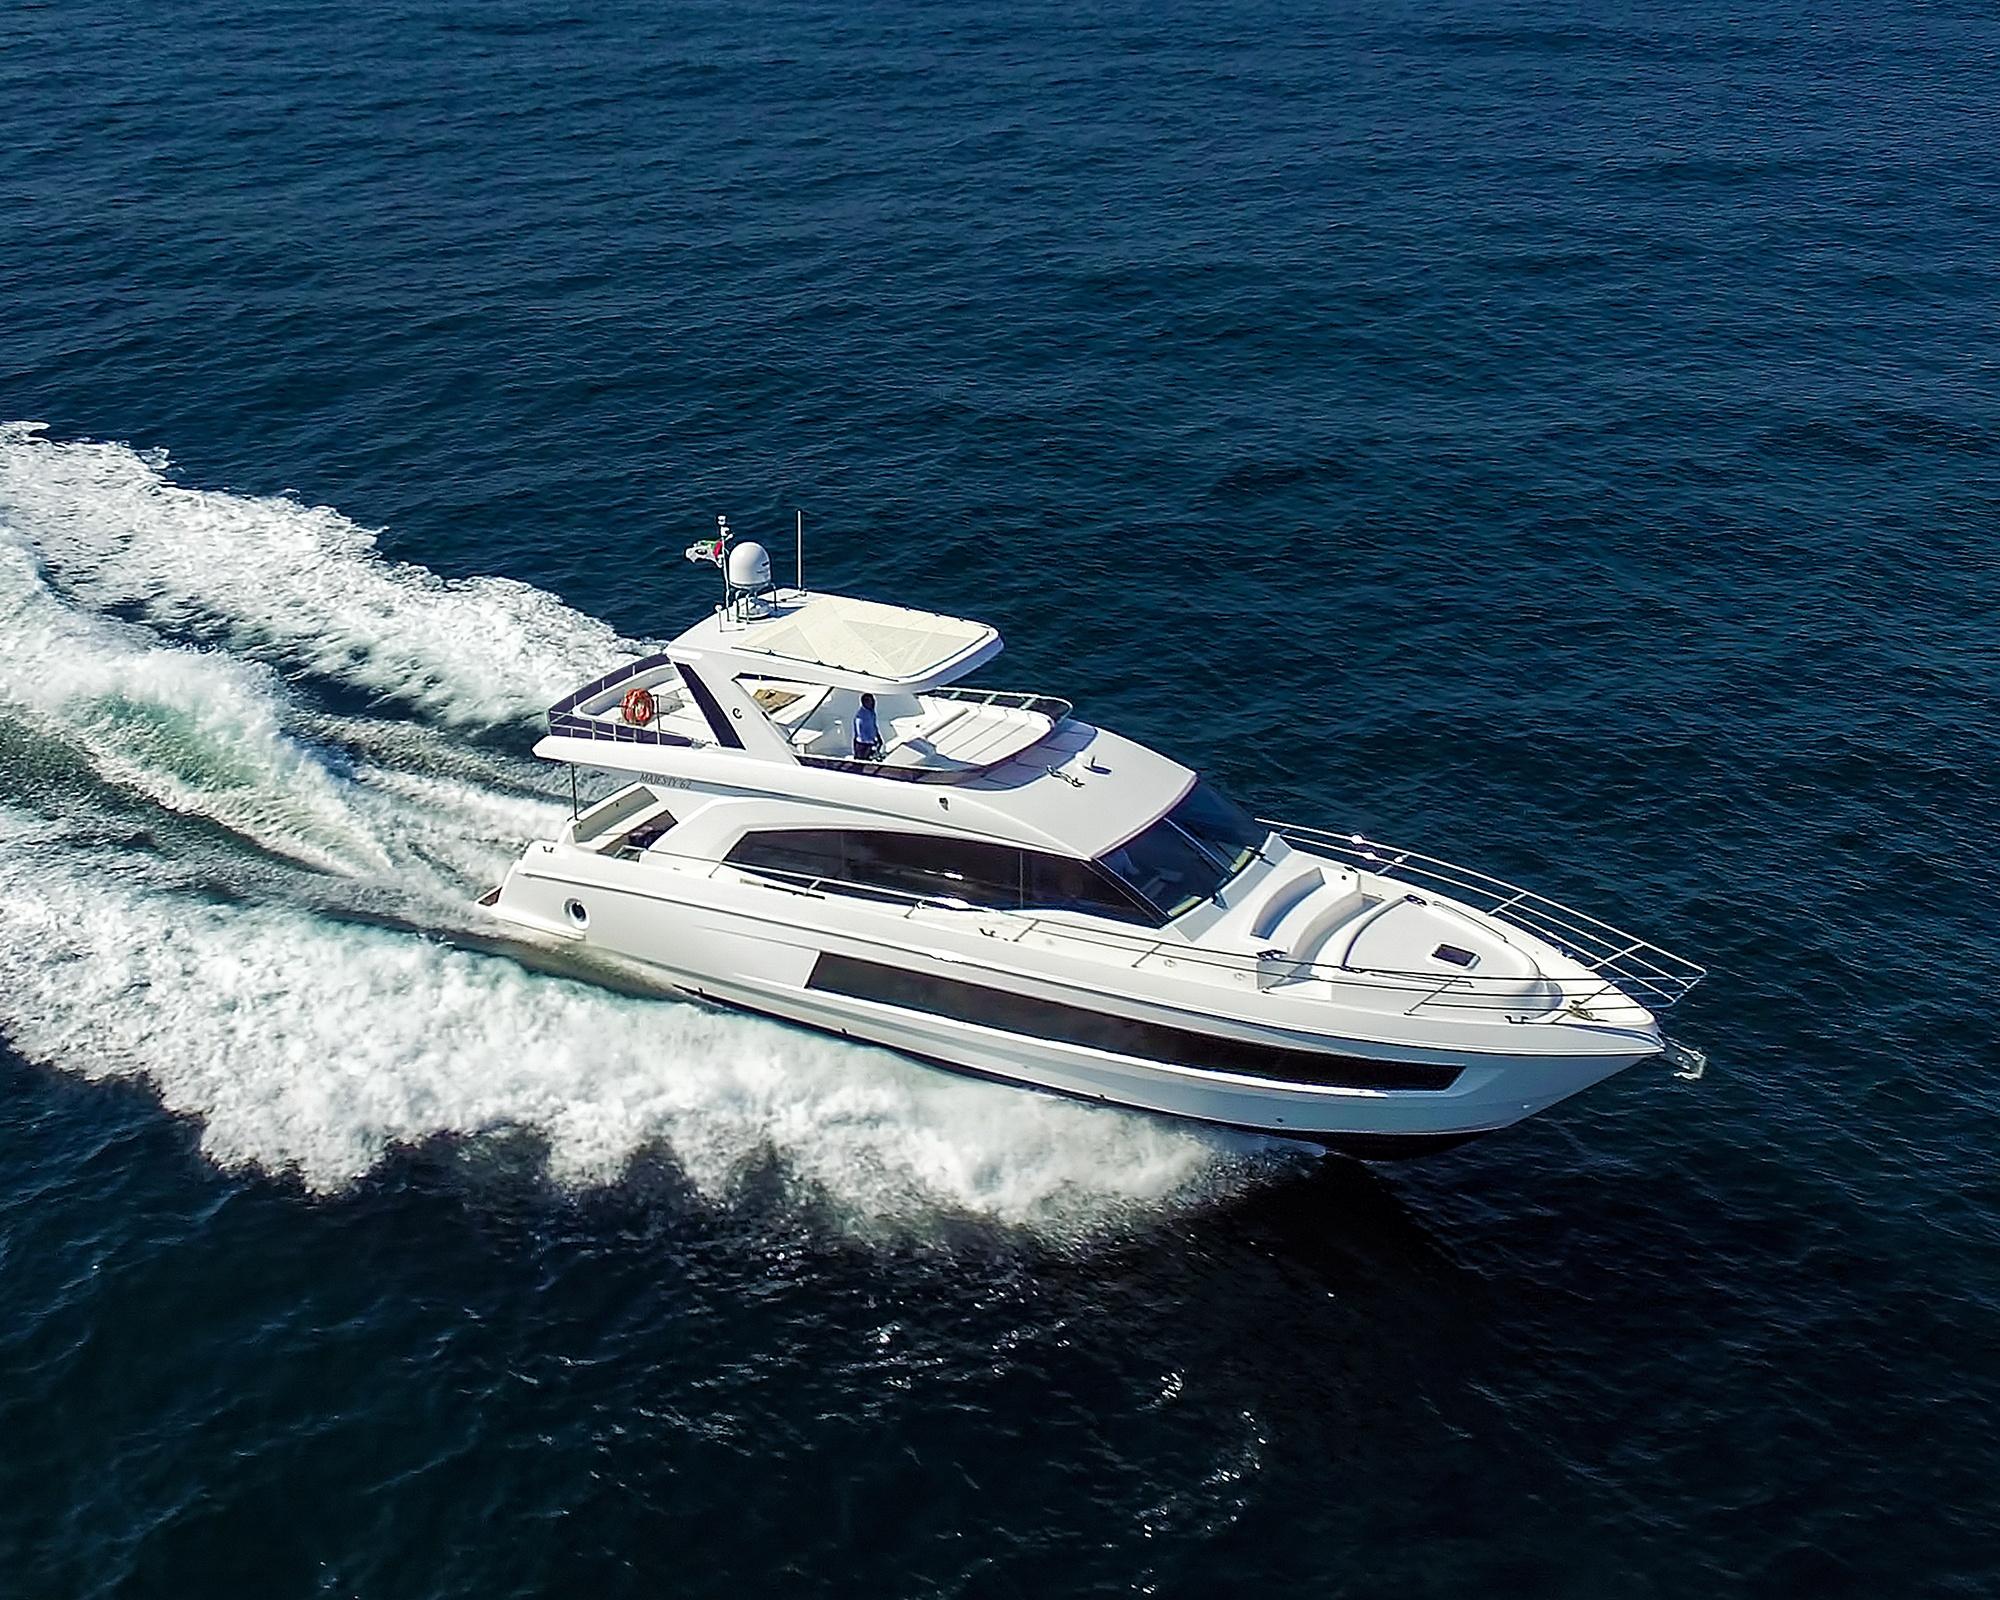 Gulf Craft's all-new Majesty 62